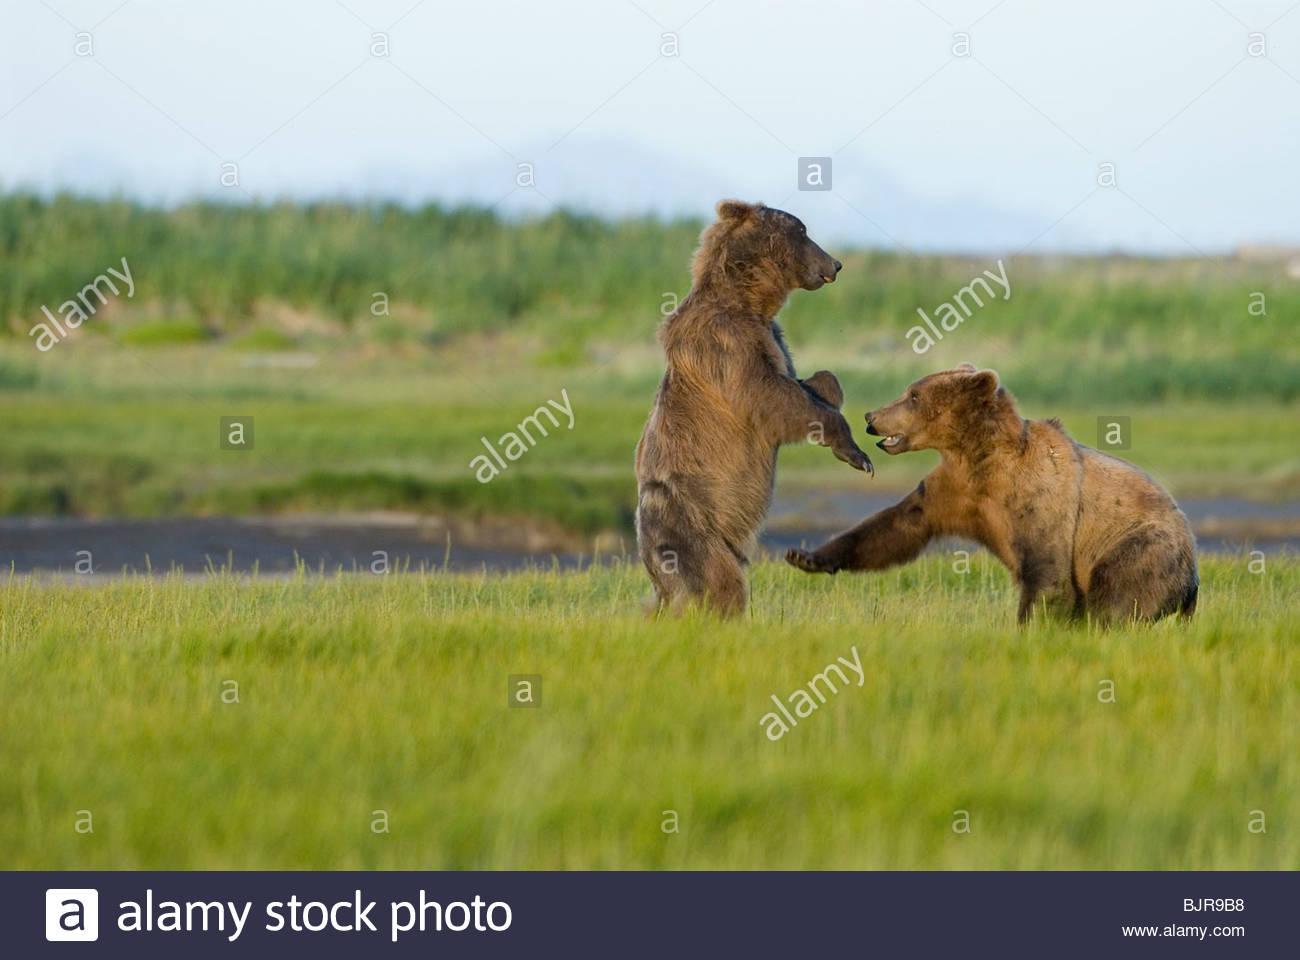 Alaskan Brown Bears sparring,play fighting, Ursus middendorffi, Katmai National Park, Alaska - Stock Image